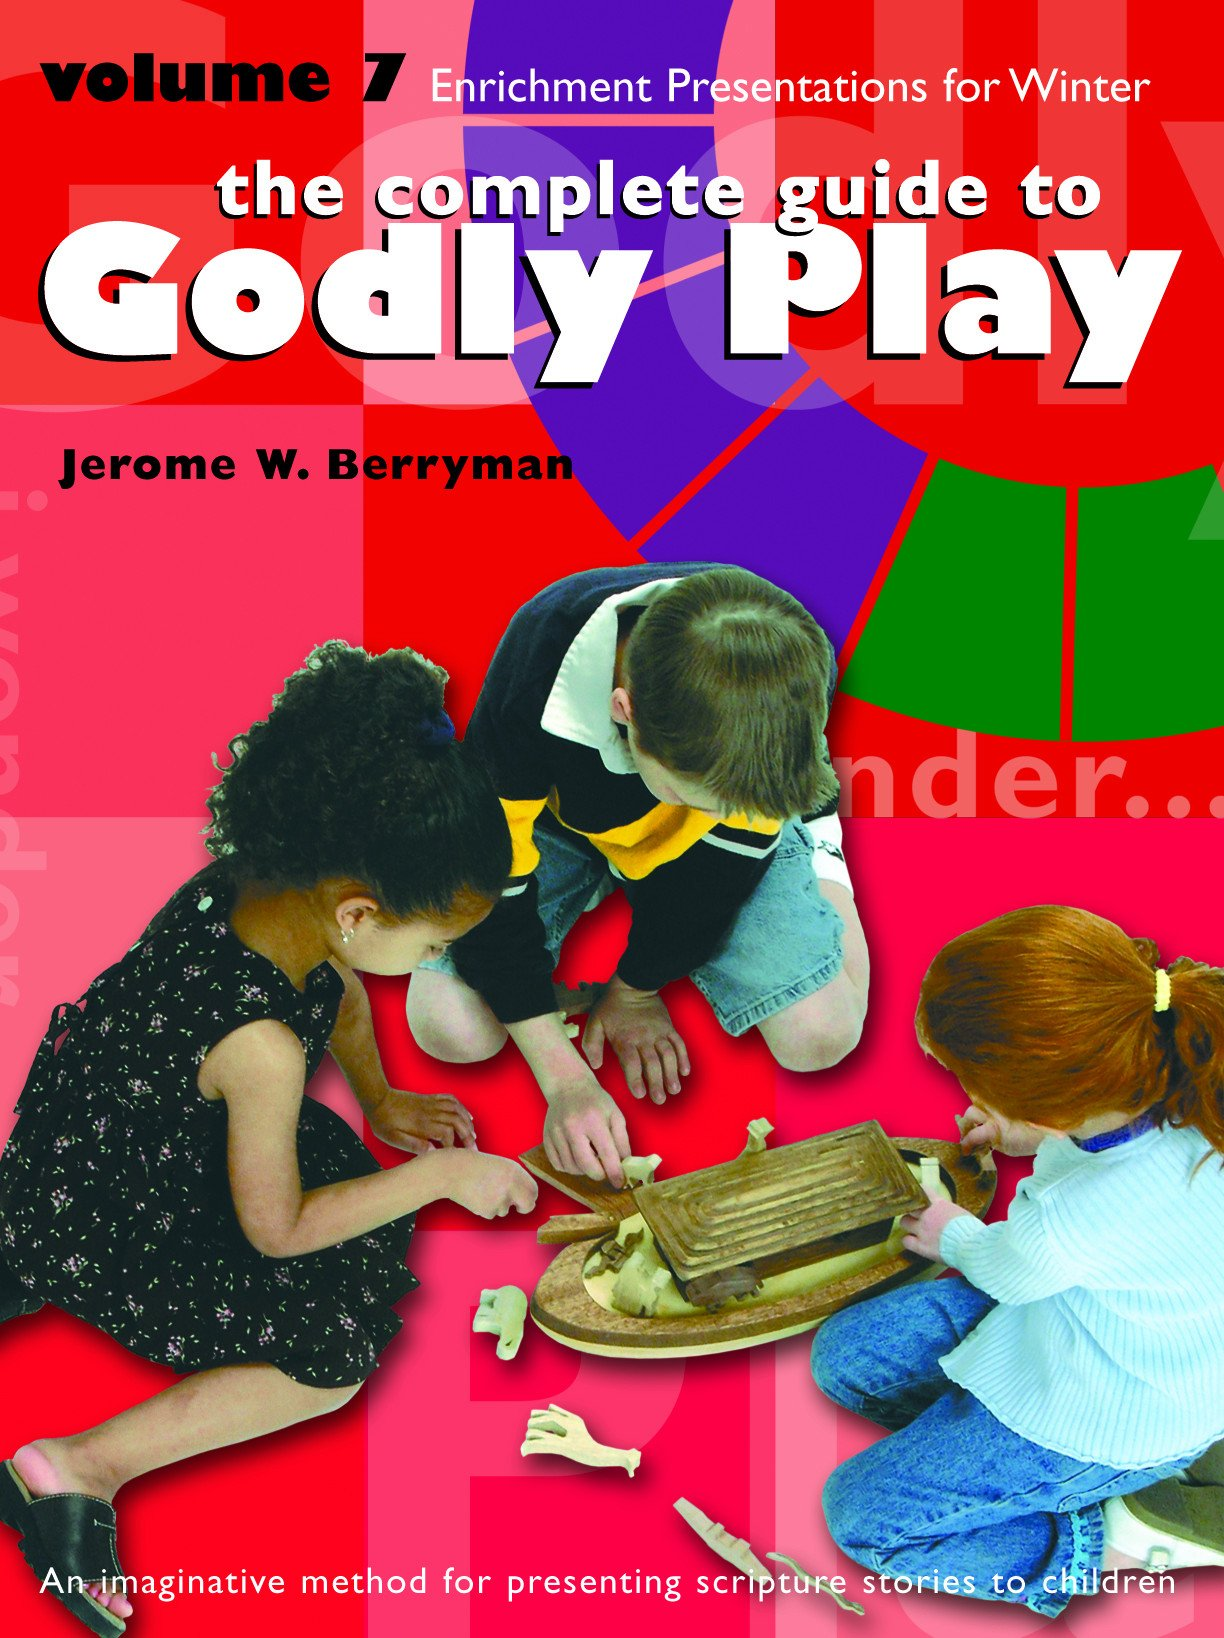 Godly Play Volume 7: Enrichment Presentations: Jerome W. Berryman:  9781931960465: Amazon.com: Books